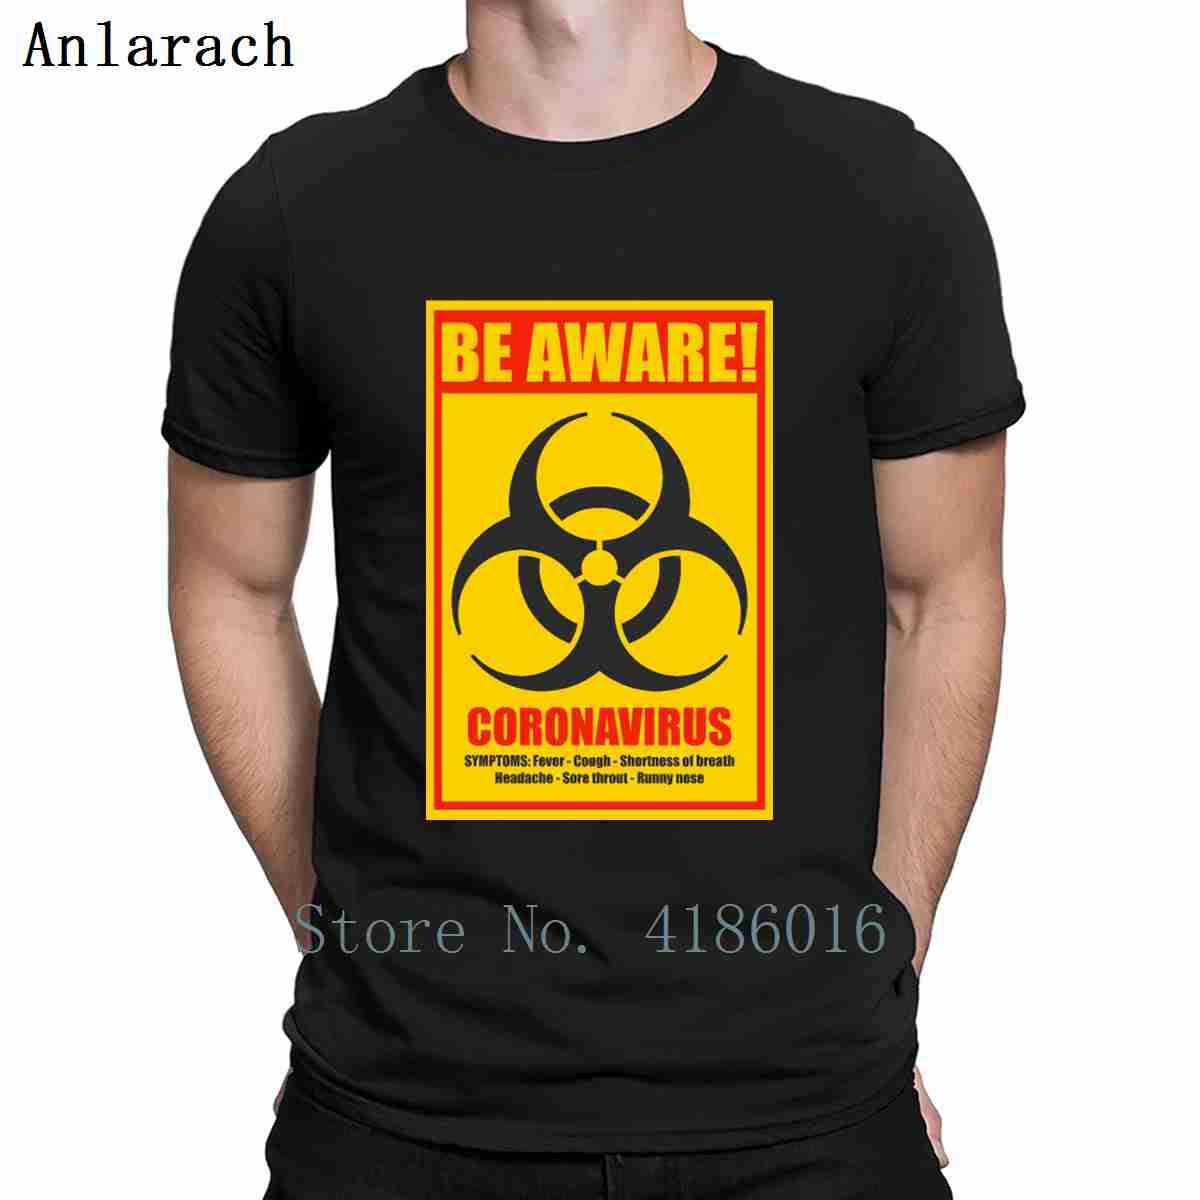 Be Aware Coronavirus Biohazard Warning Sign T Shirt Fitness Spring Short Sleeve S-XXXXXL New Style Leisure Printing Letter Shirt